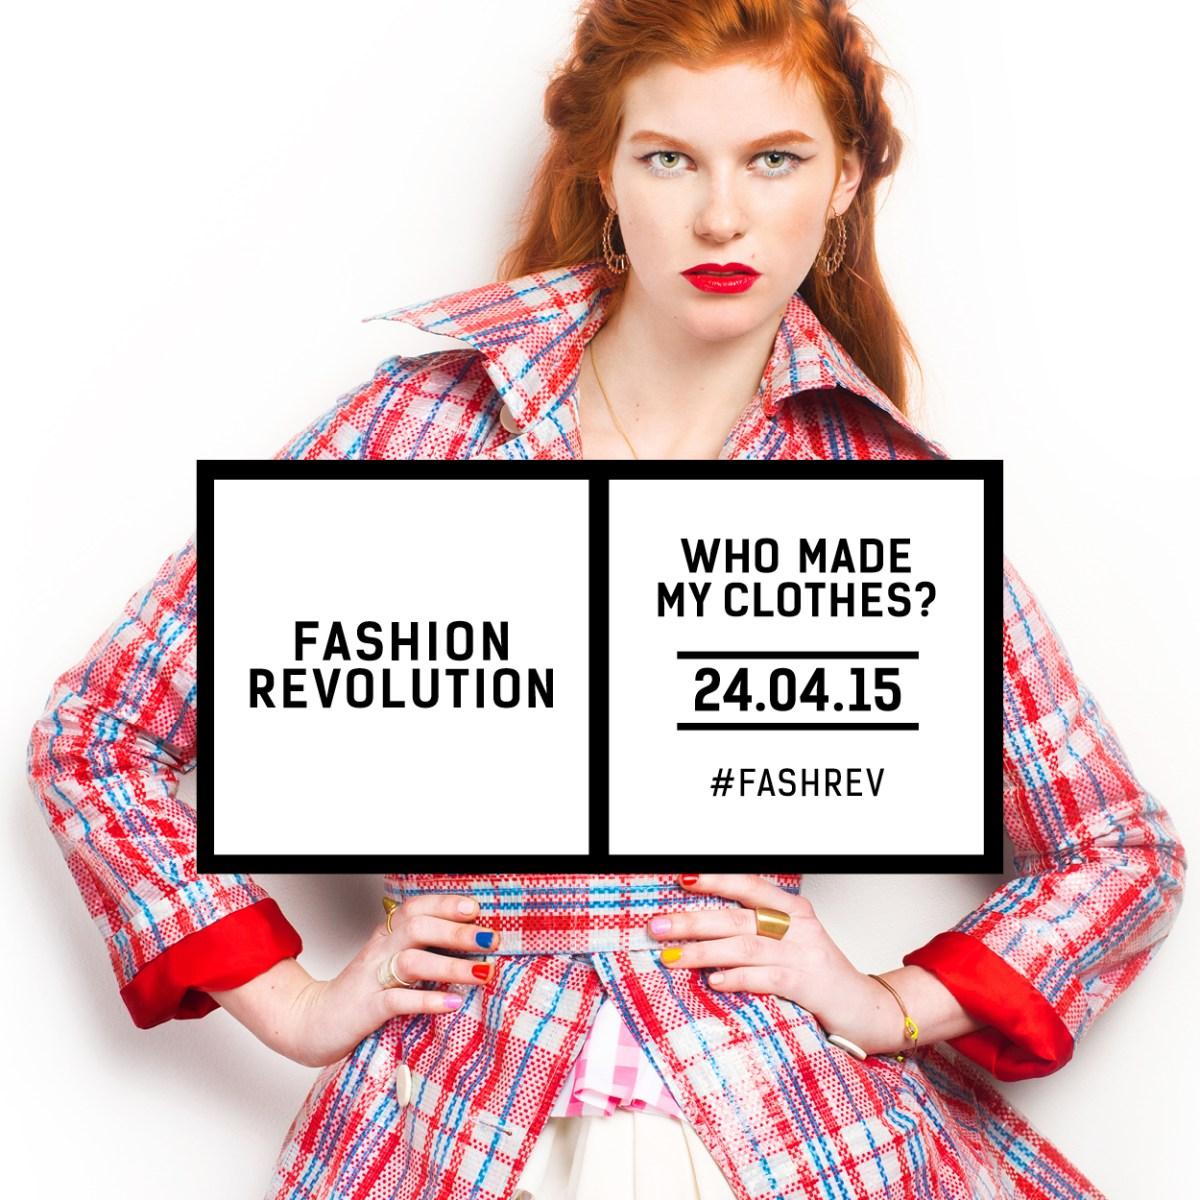 Choosing Human talks about the Fashion Revolution